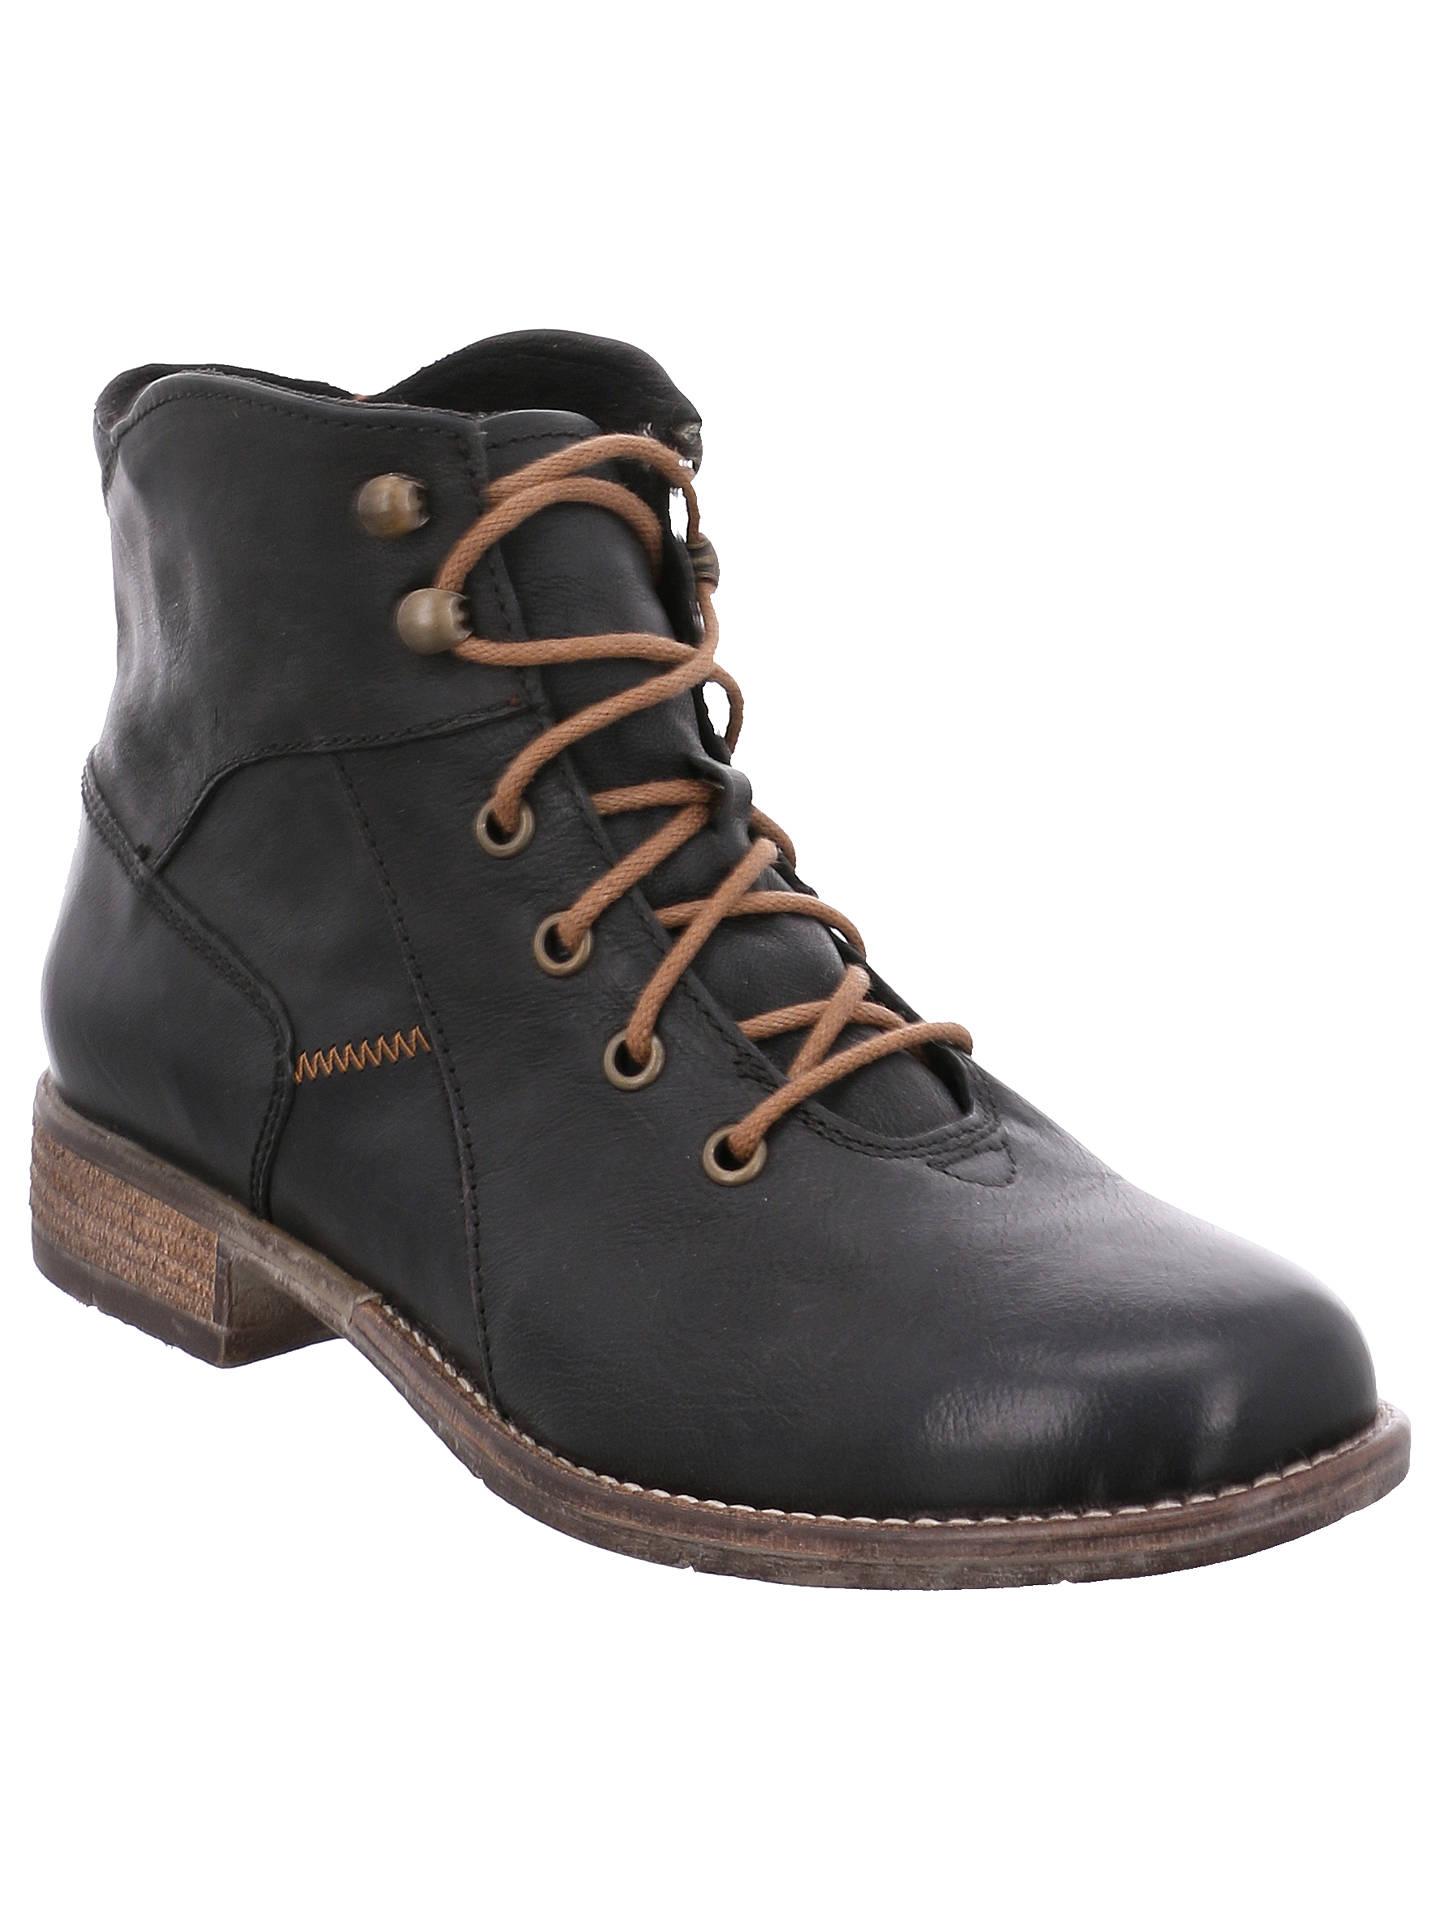 best website 981d0 11e54 Josef Seibel Sienna 11 Block Heeled Ankle Boots, Black ...